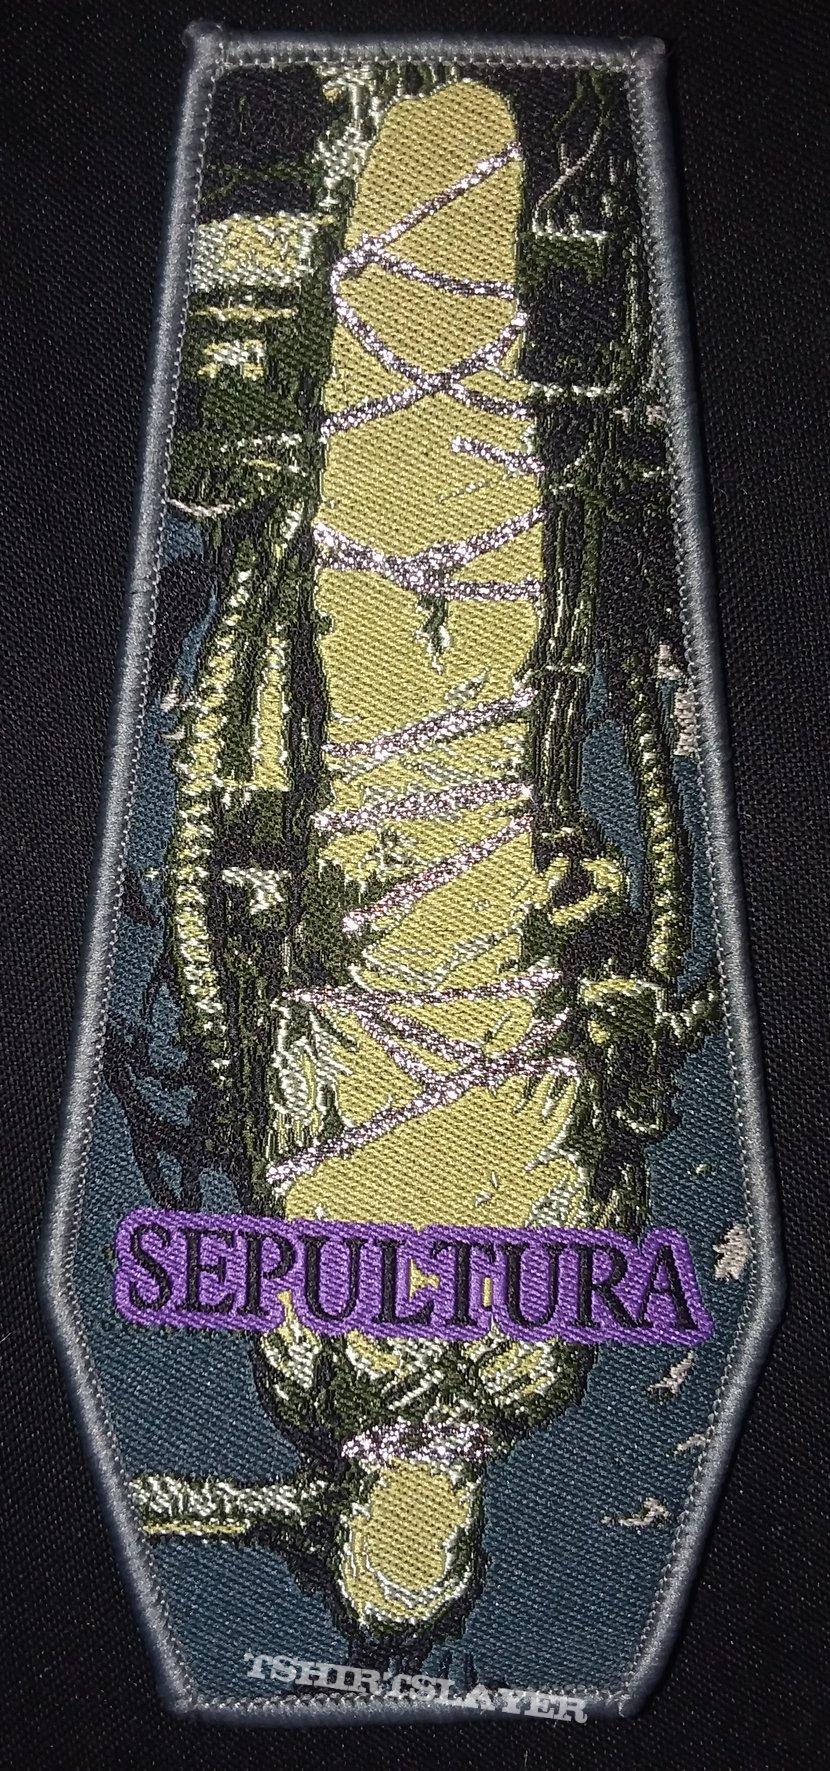 Sepultura - Chaos A.D. coffin patch